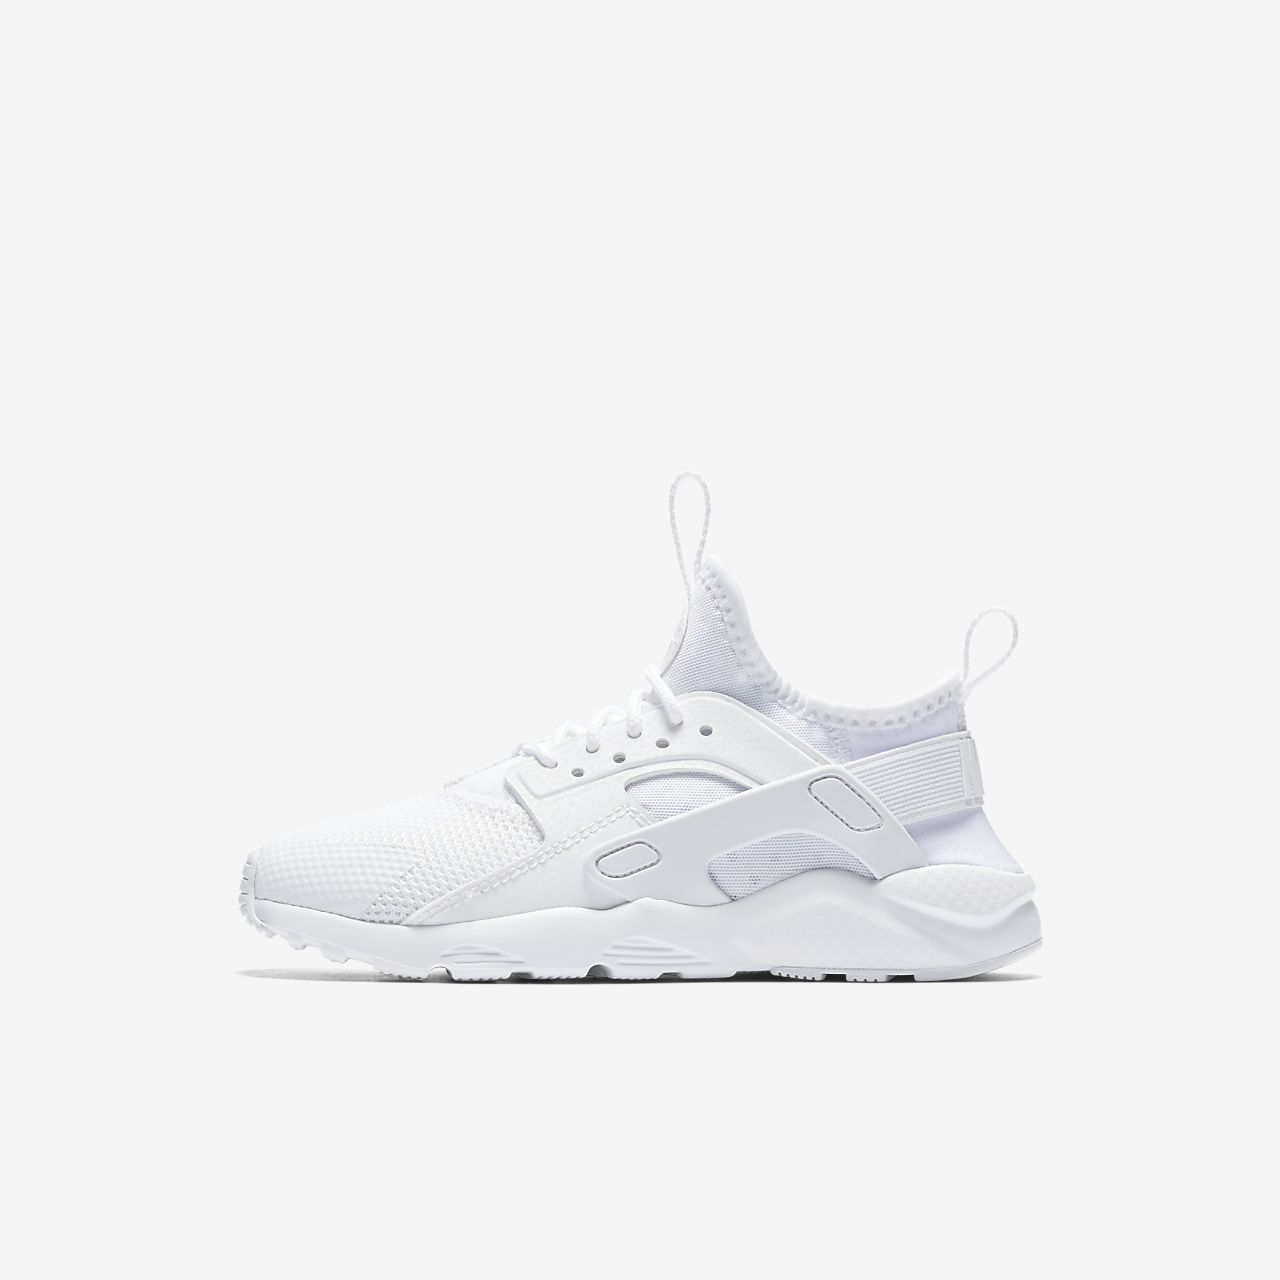 Chaussure Nike Huarache Ultra pour Jeune enfant